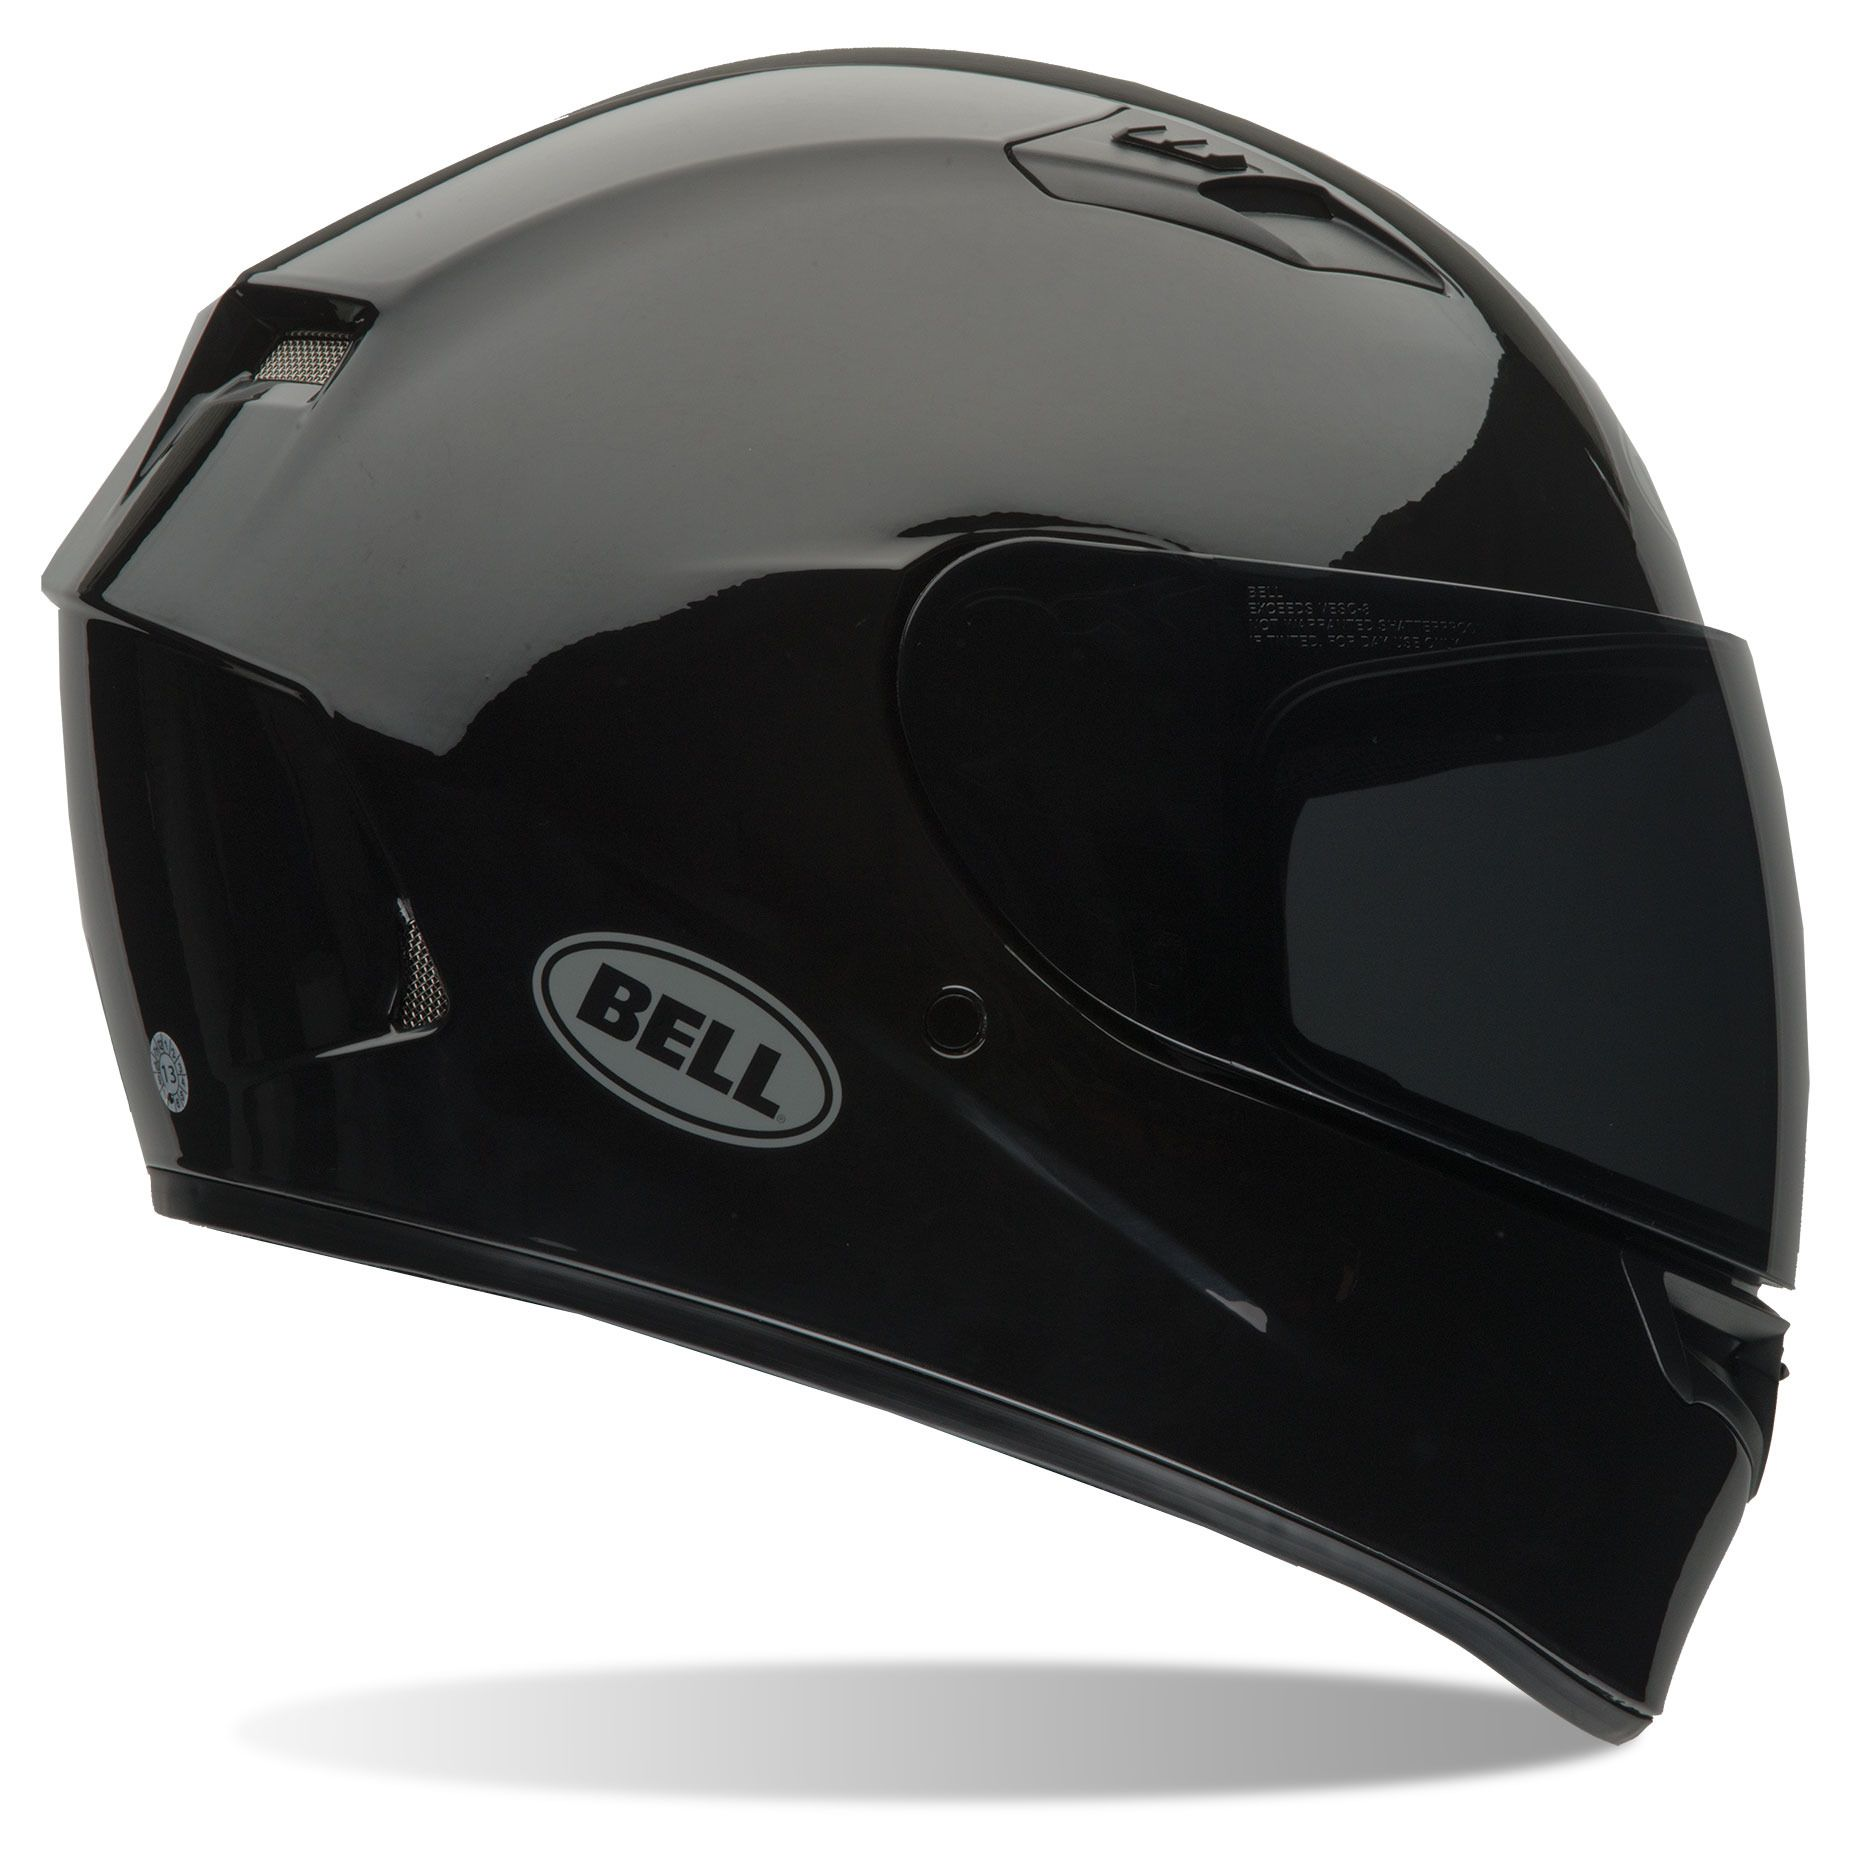 The 10 Best Modular Motorcycle Helmets | Improb